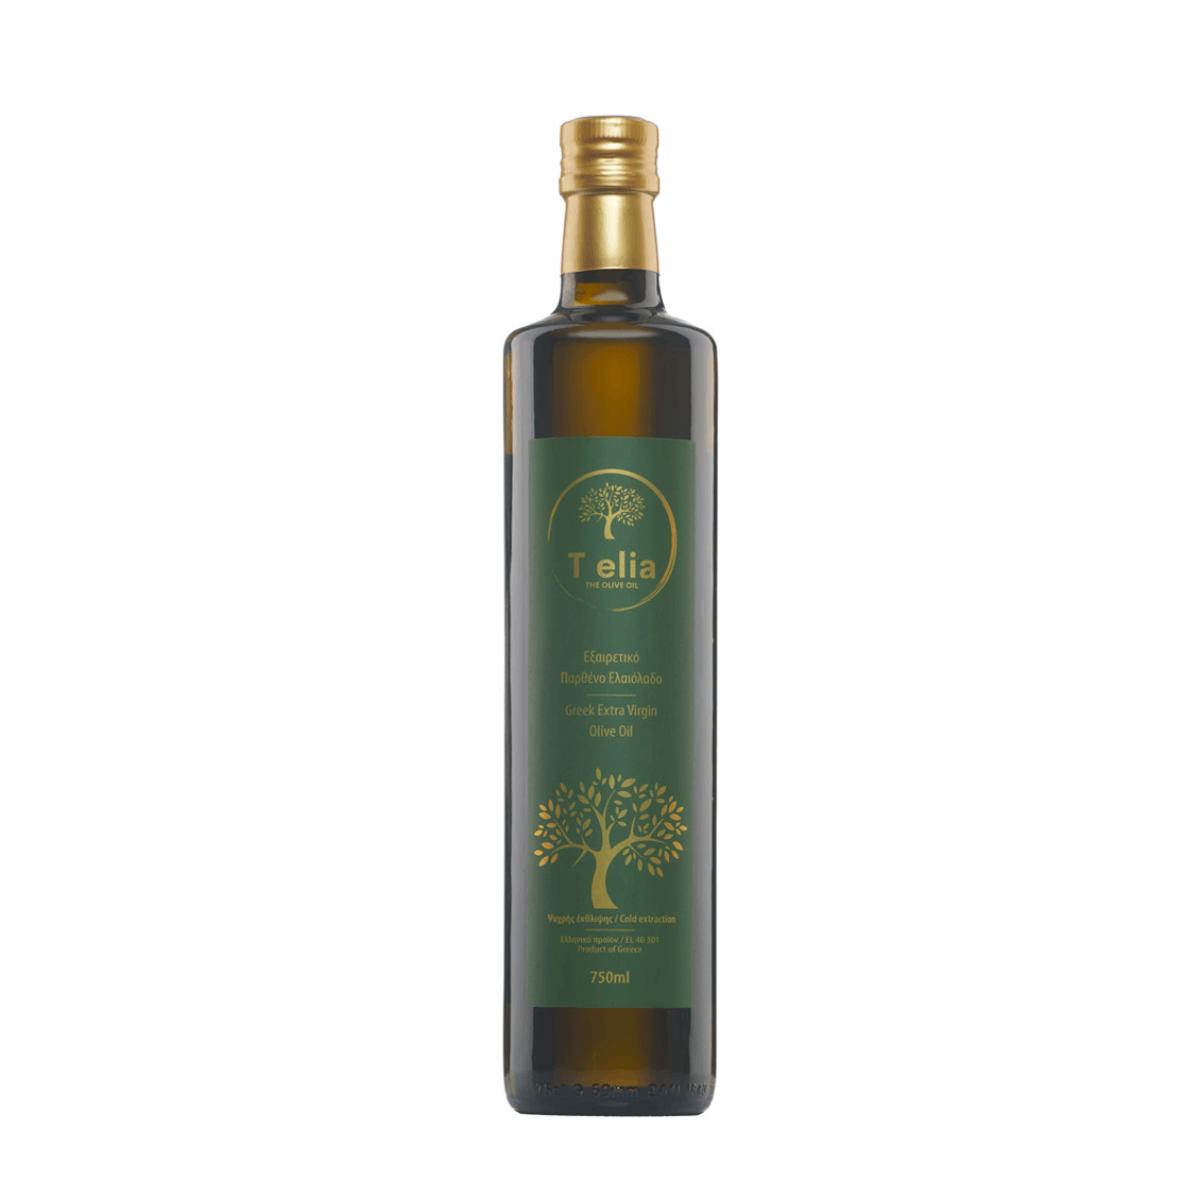 Telia Olive Oil – Premium EVOO 750ml